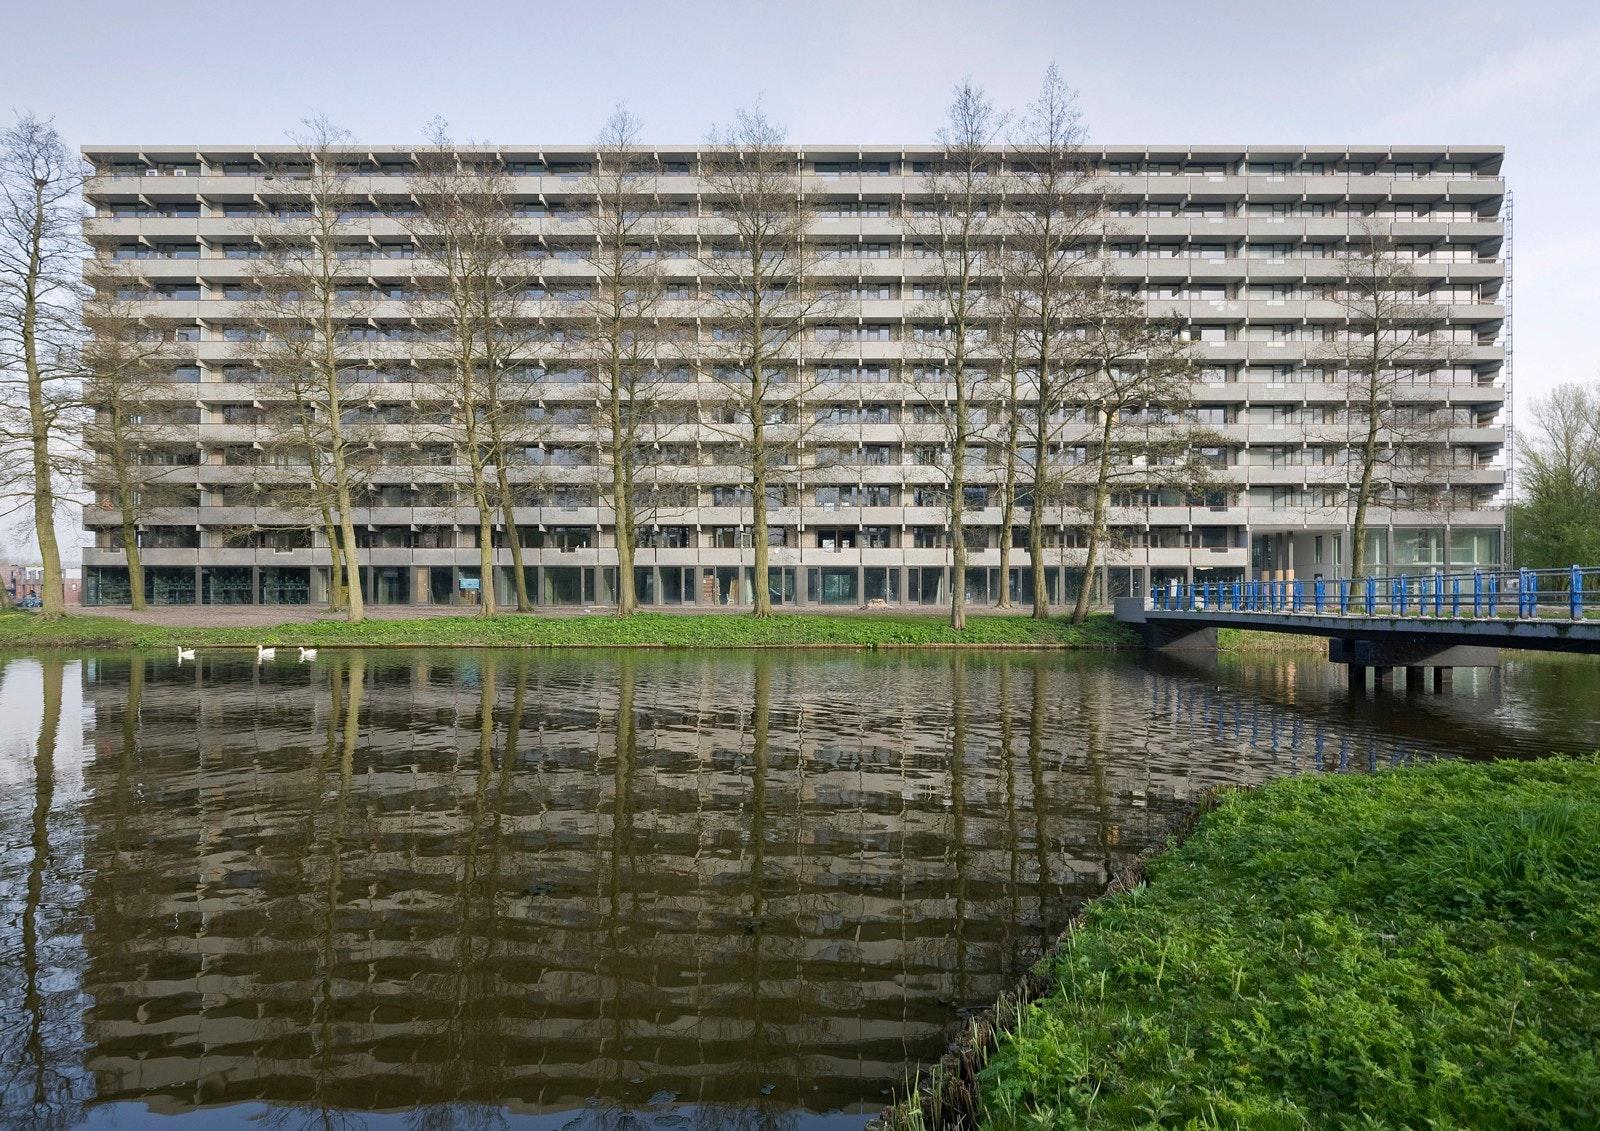 DeFlatKleiburg Wins 2017 Mies Van Der Rohe Award, MSA/V+ Named 2017  Emerging Architect